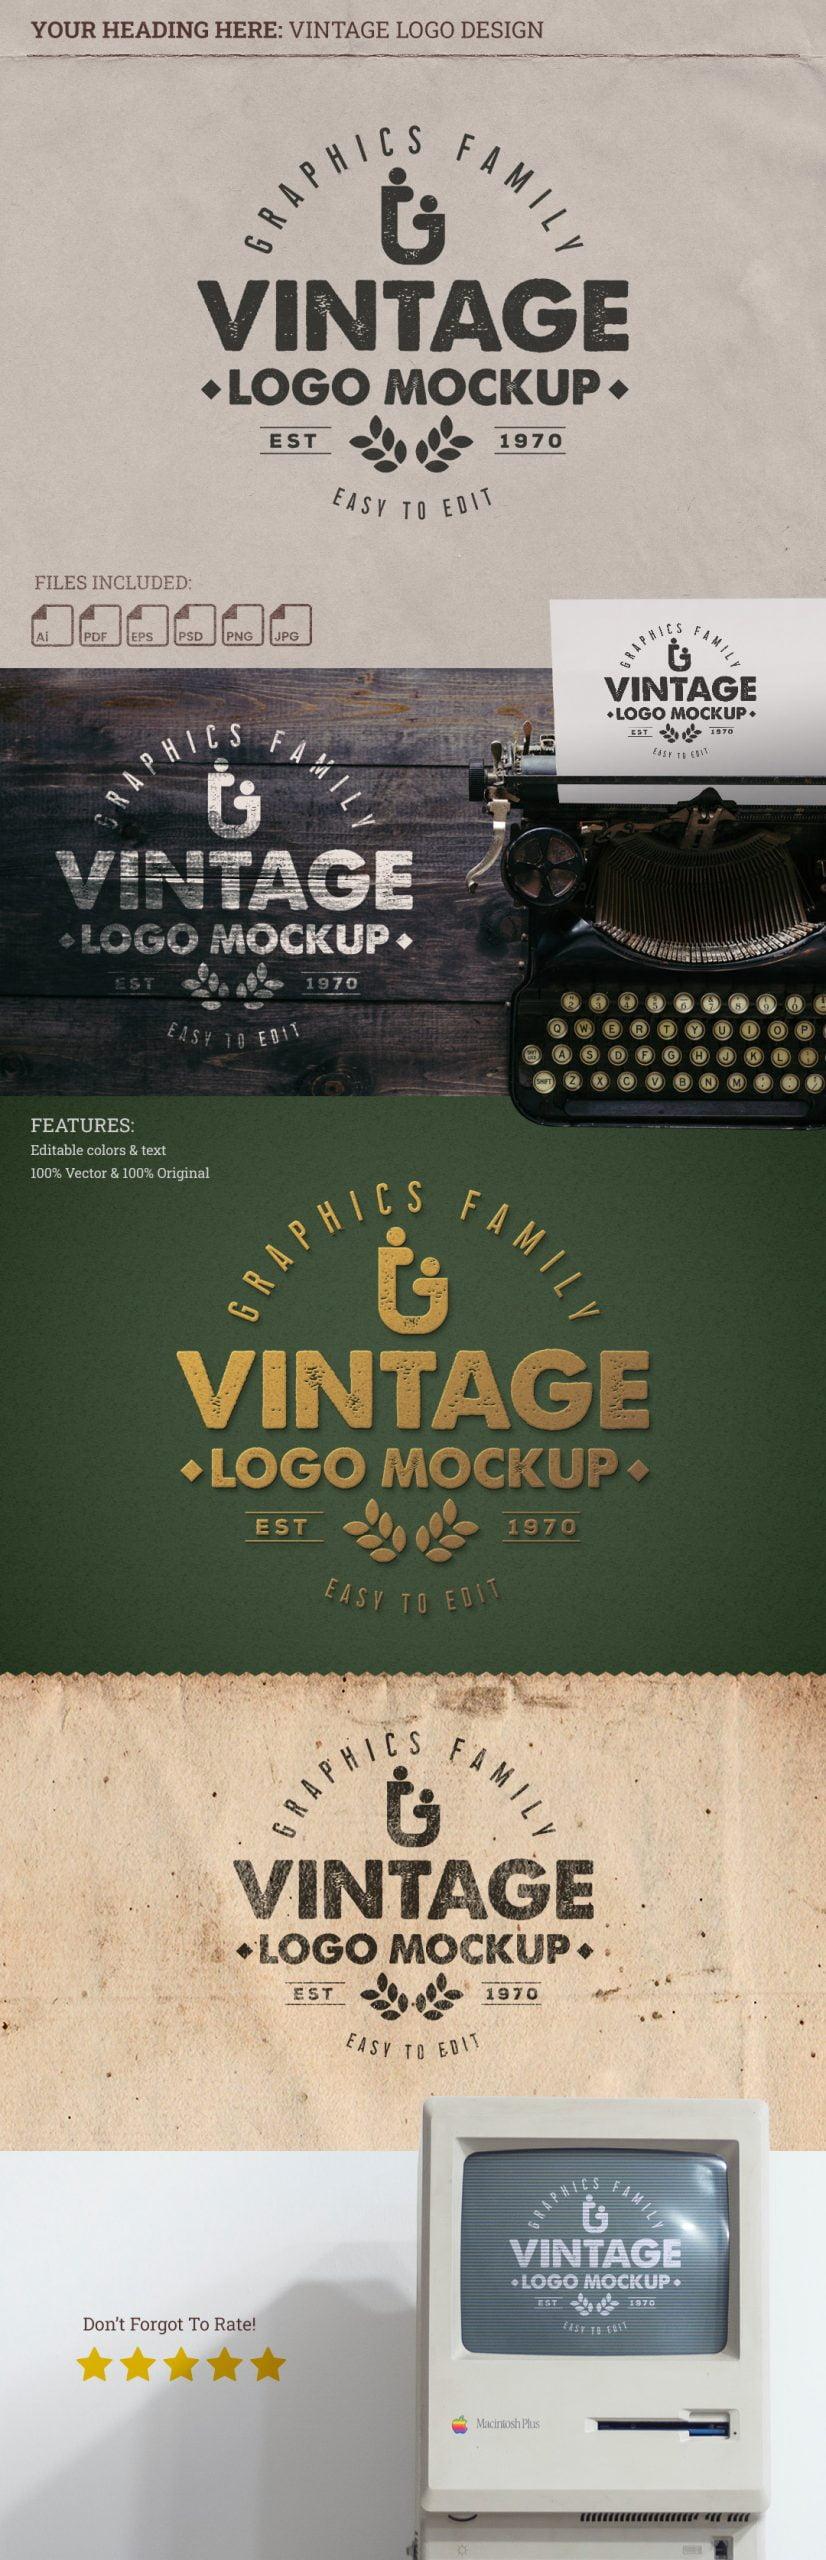 Free-Vintage-Logo-Preview-Generator-